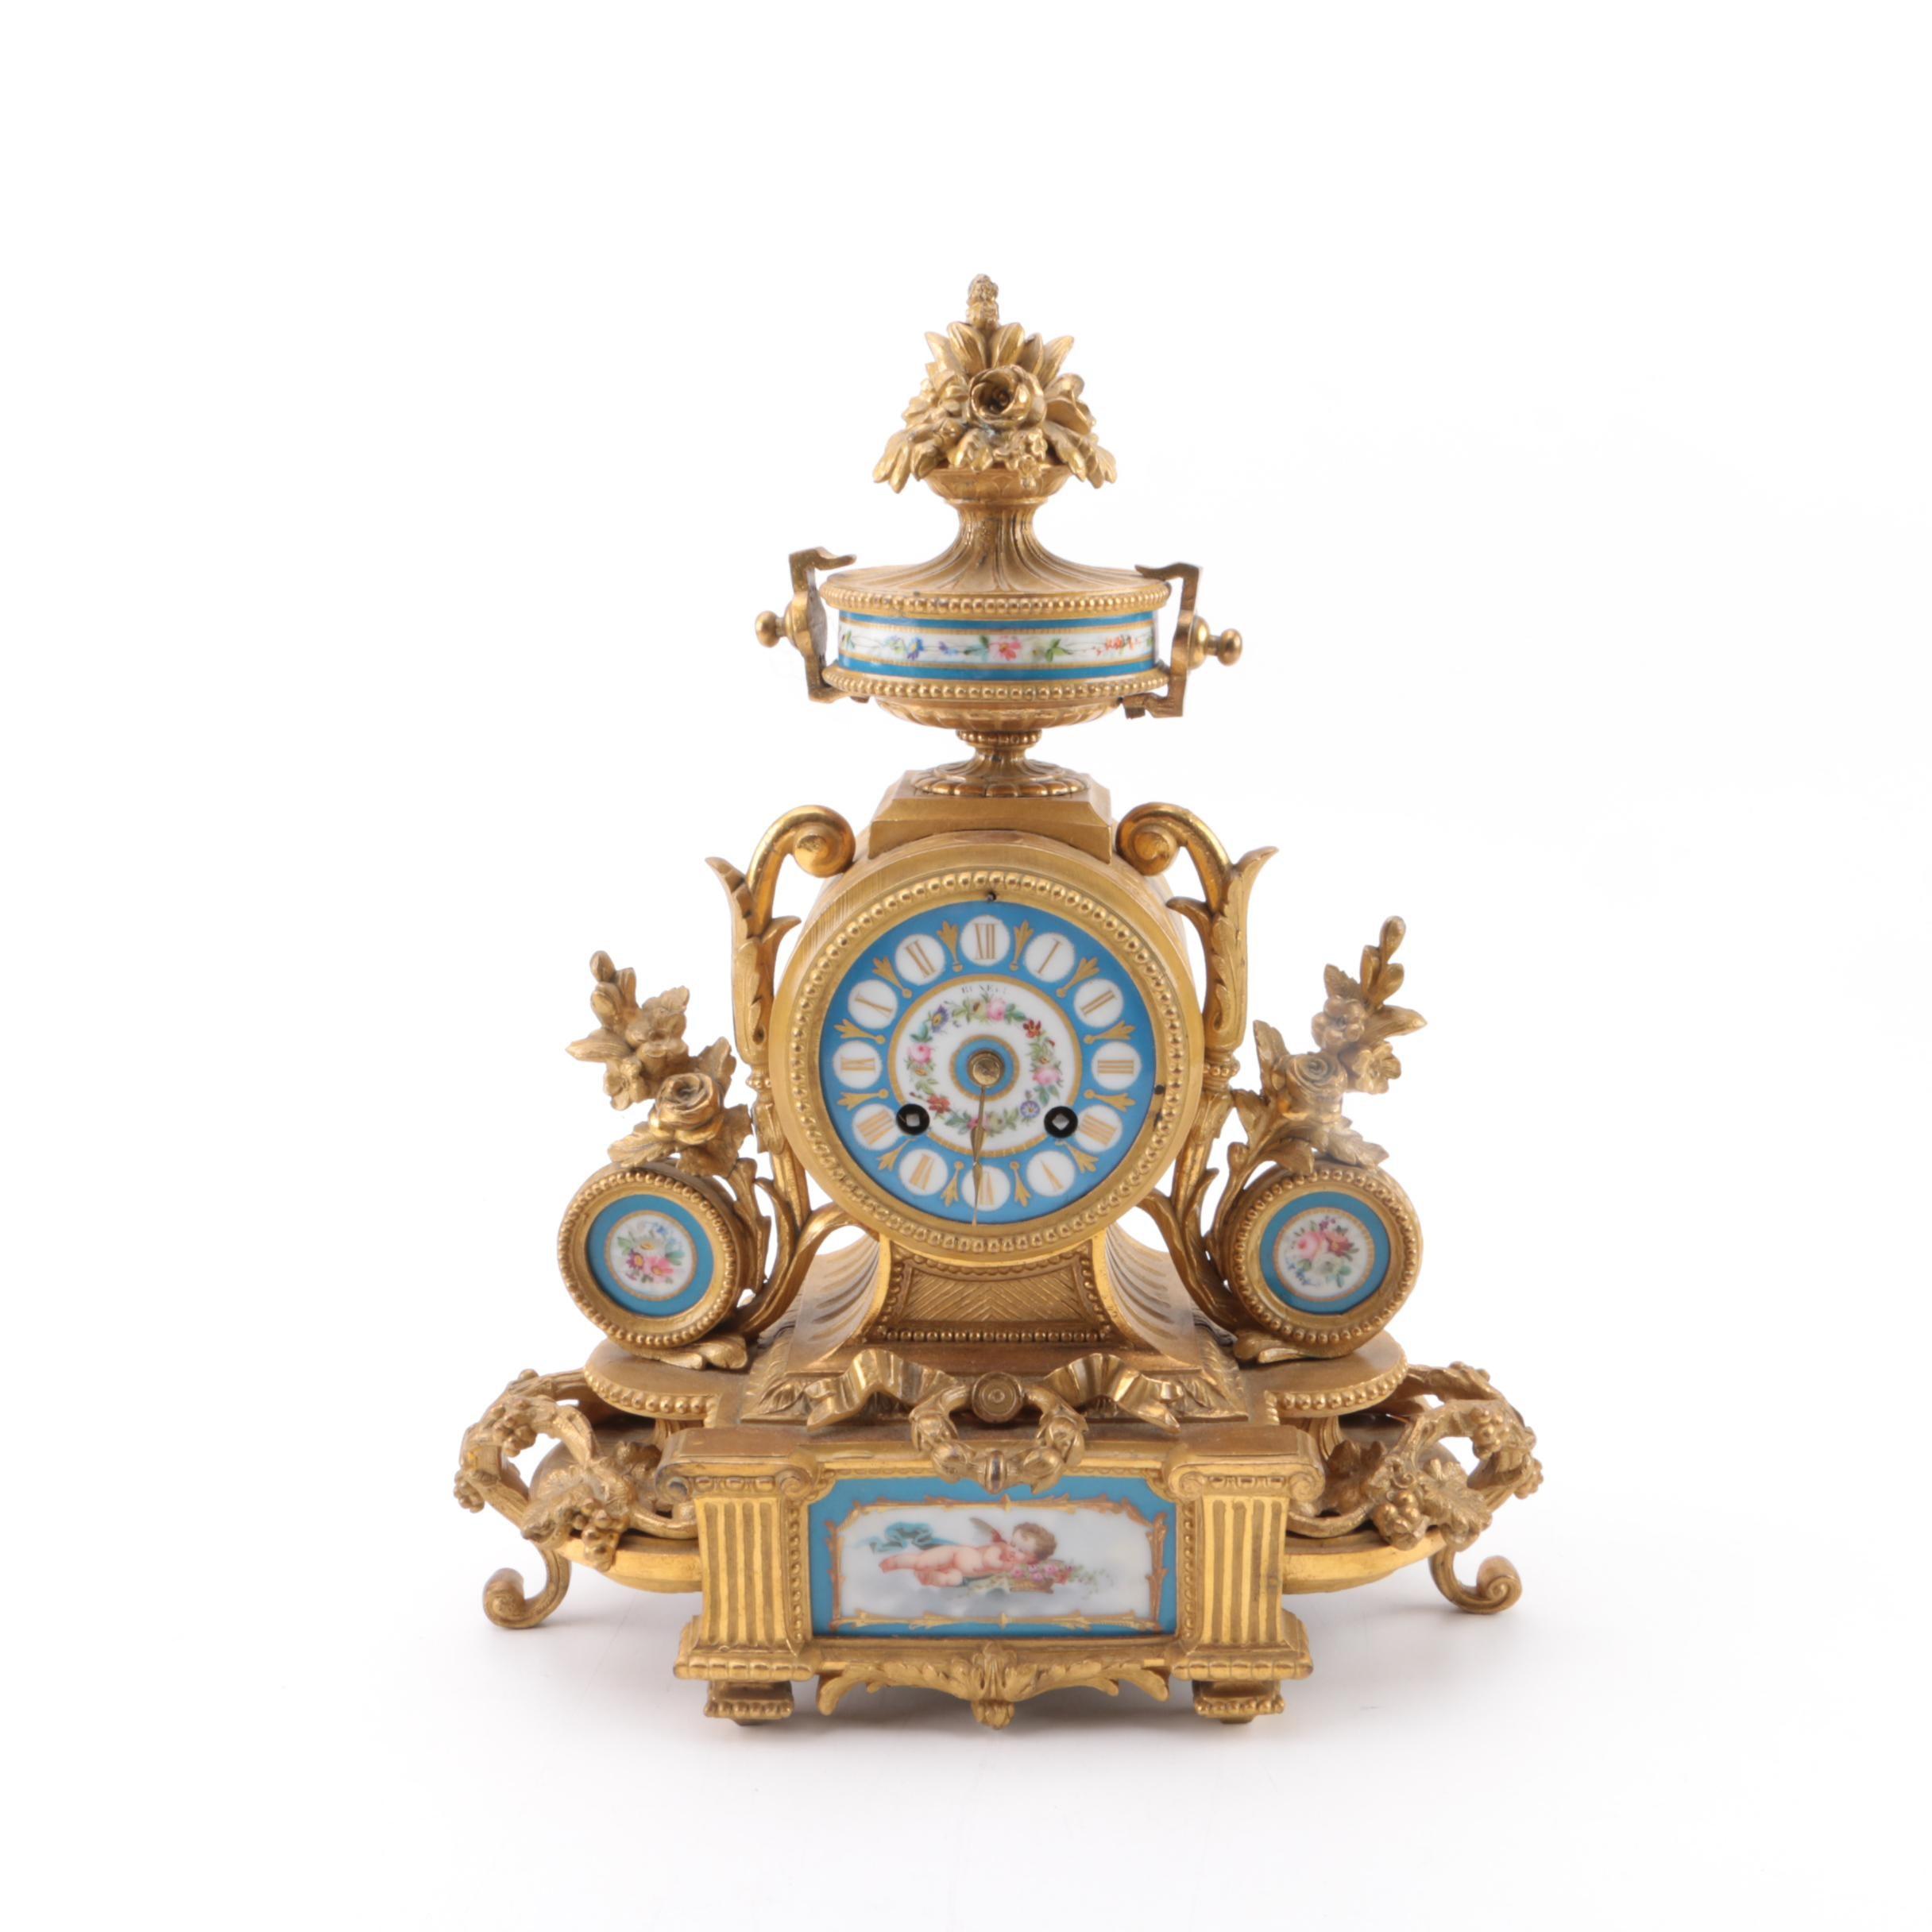 Antique Bronze P.H. Mourey Bronze D'ore Mantel Clock